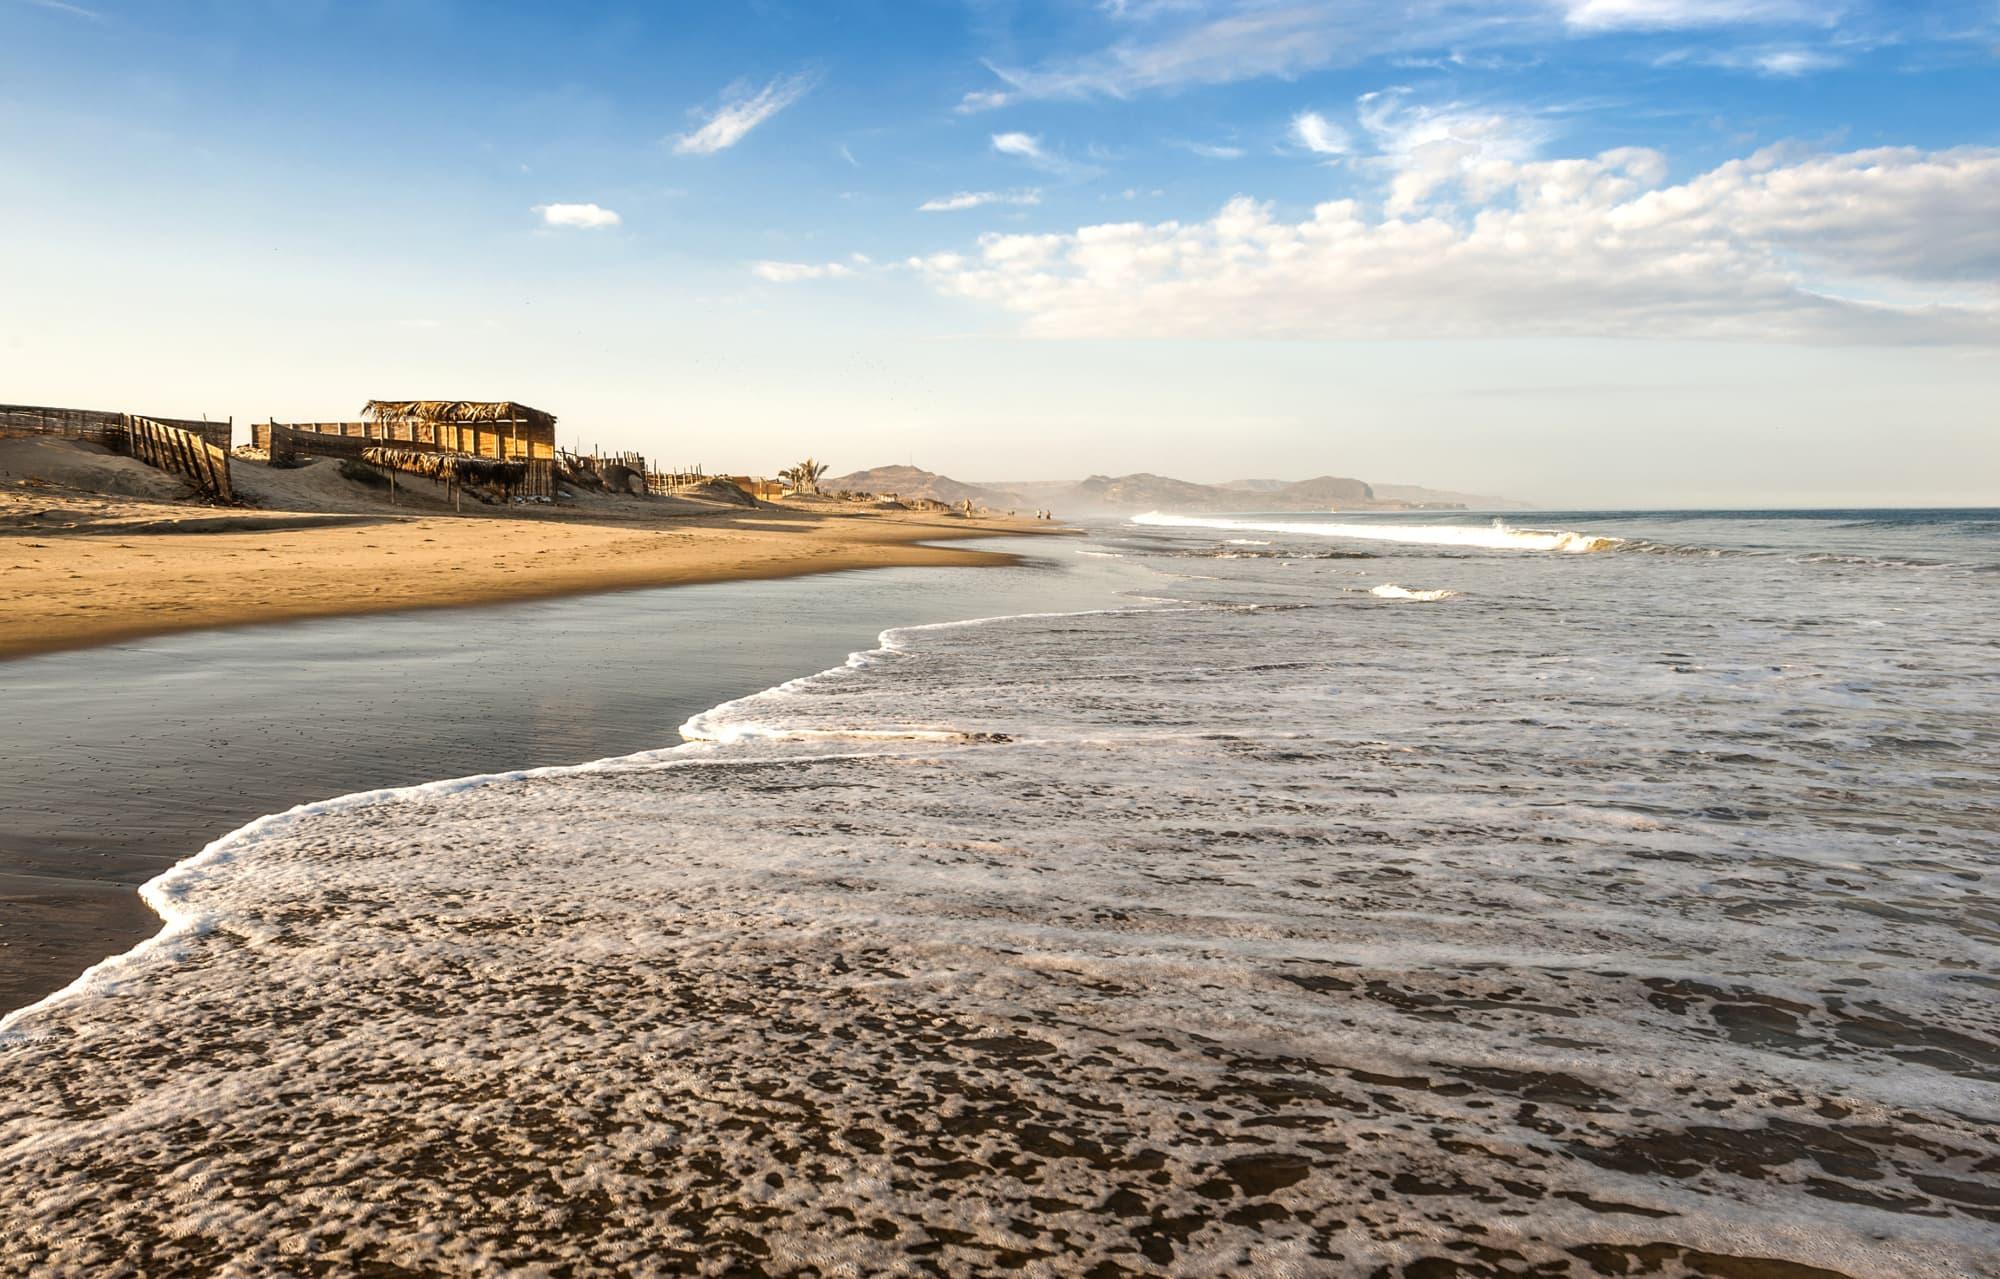 Strandabschnitt in Peru